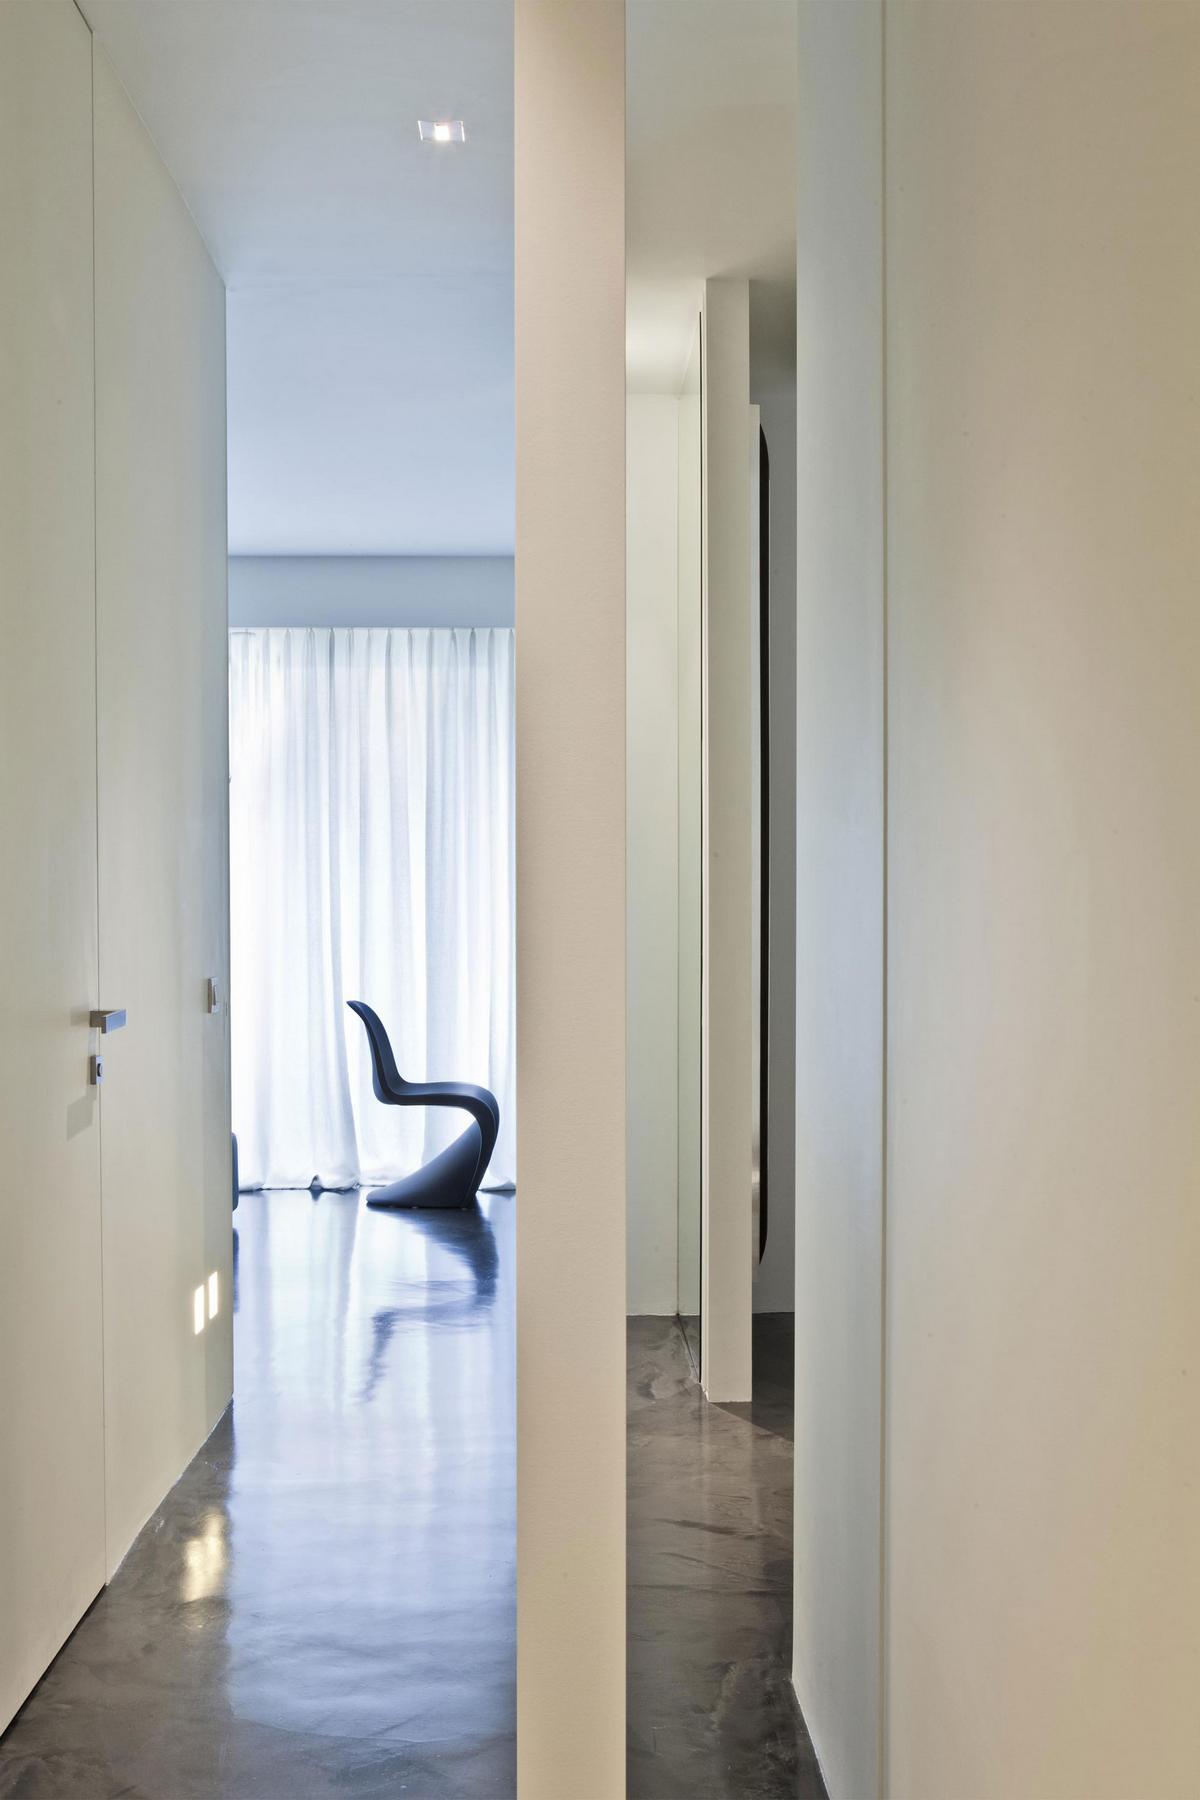 Квартира в МонтеКарло, квартира в Монако, жилье в Монако, Federico Delrosso Architects, дизайн квартиры минимализм, проект роскошной квартиры